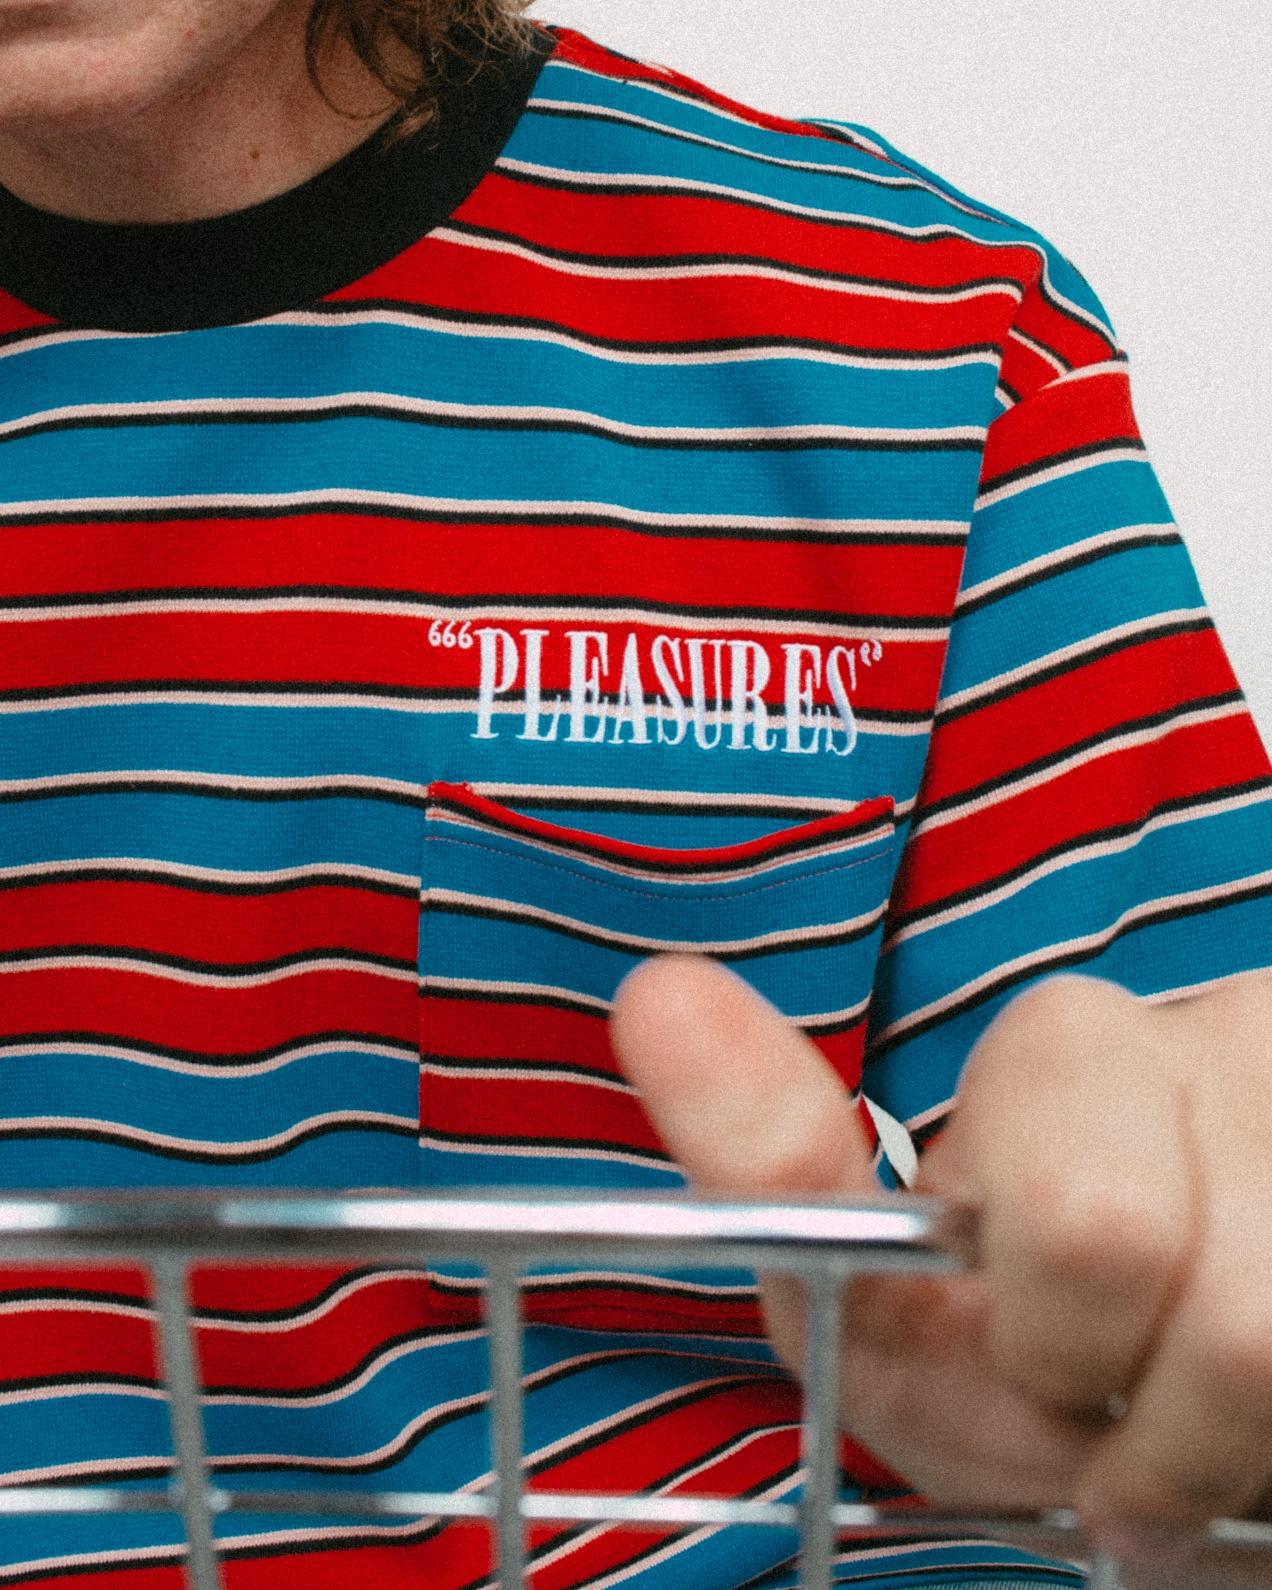 【PLEASURES/プレジャーズ】CHAINSMOKE STRIPE SS SHIR カットソーTシャツ / BLUE/MAROON